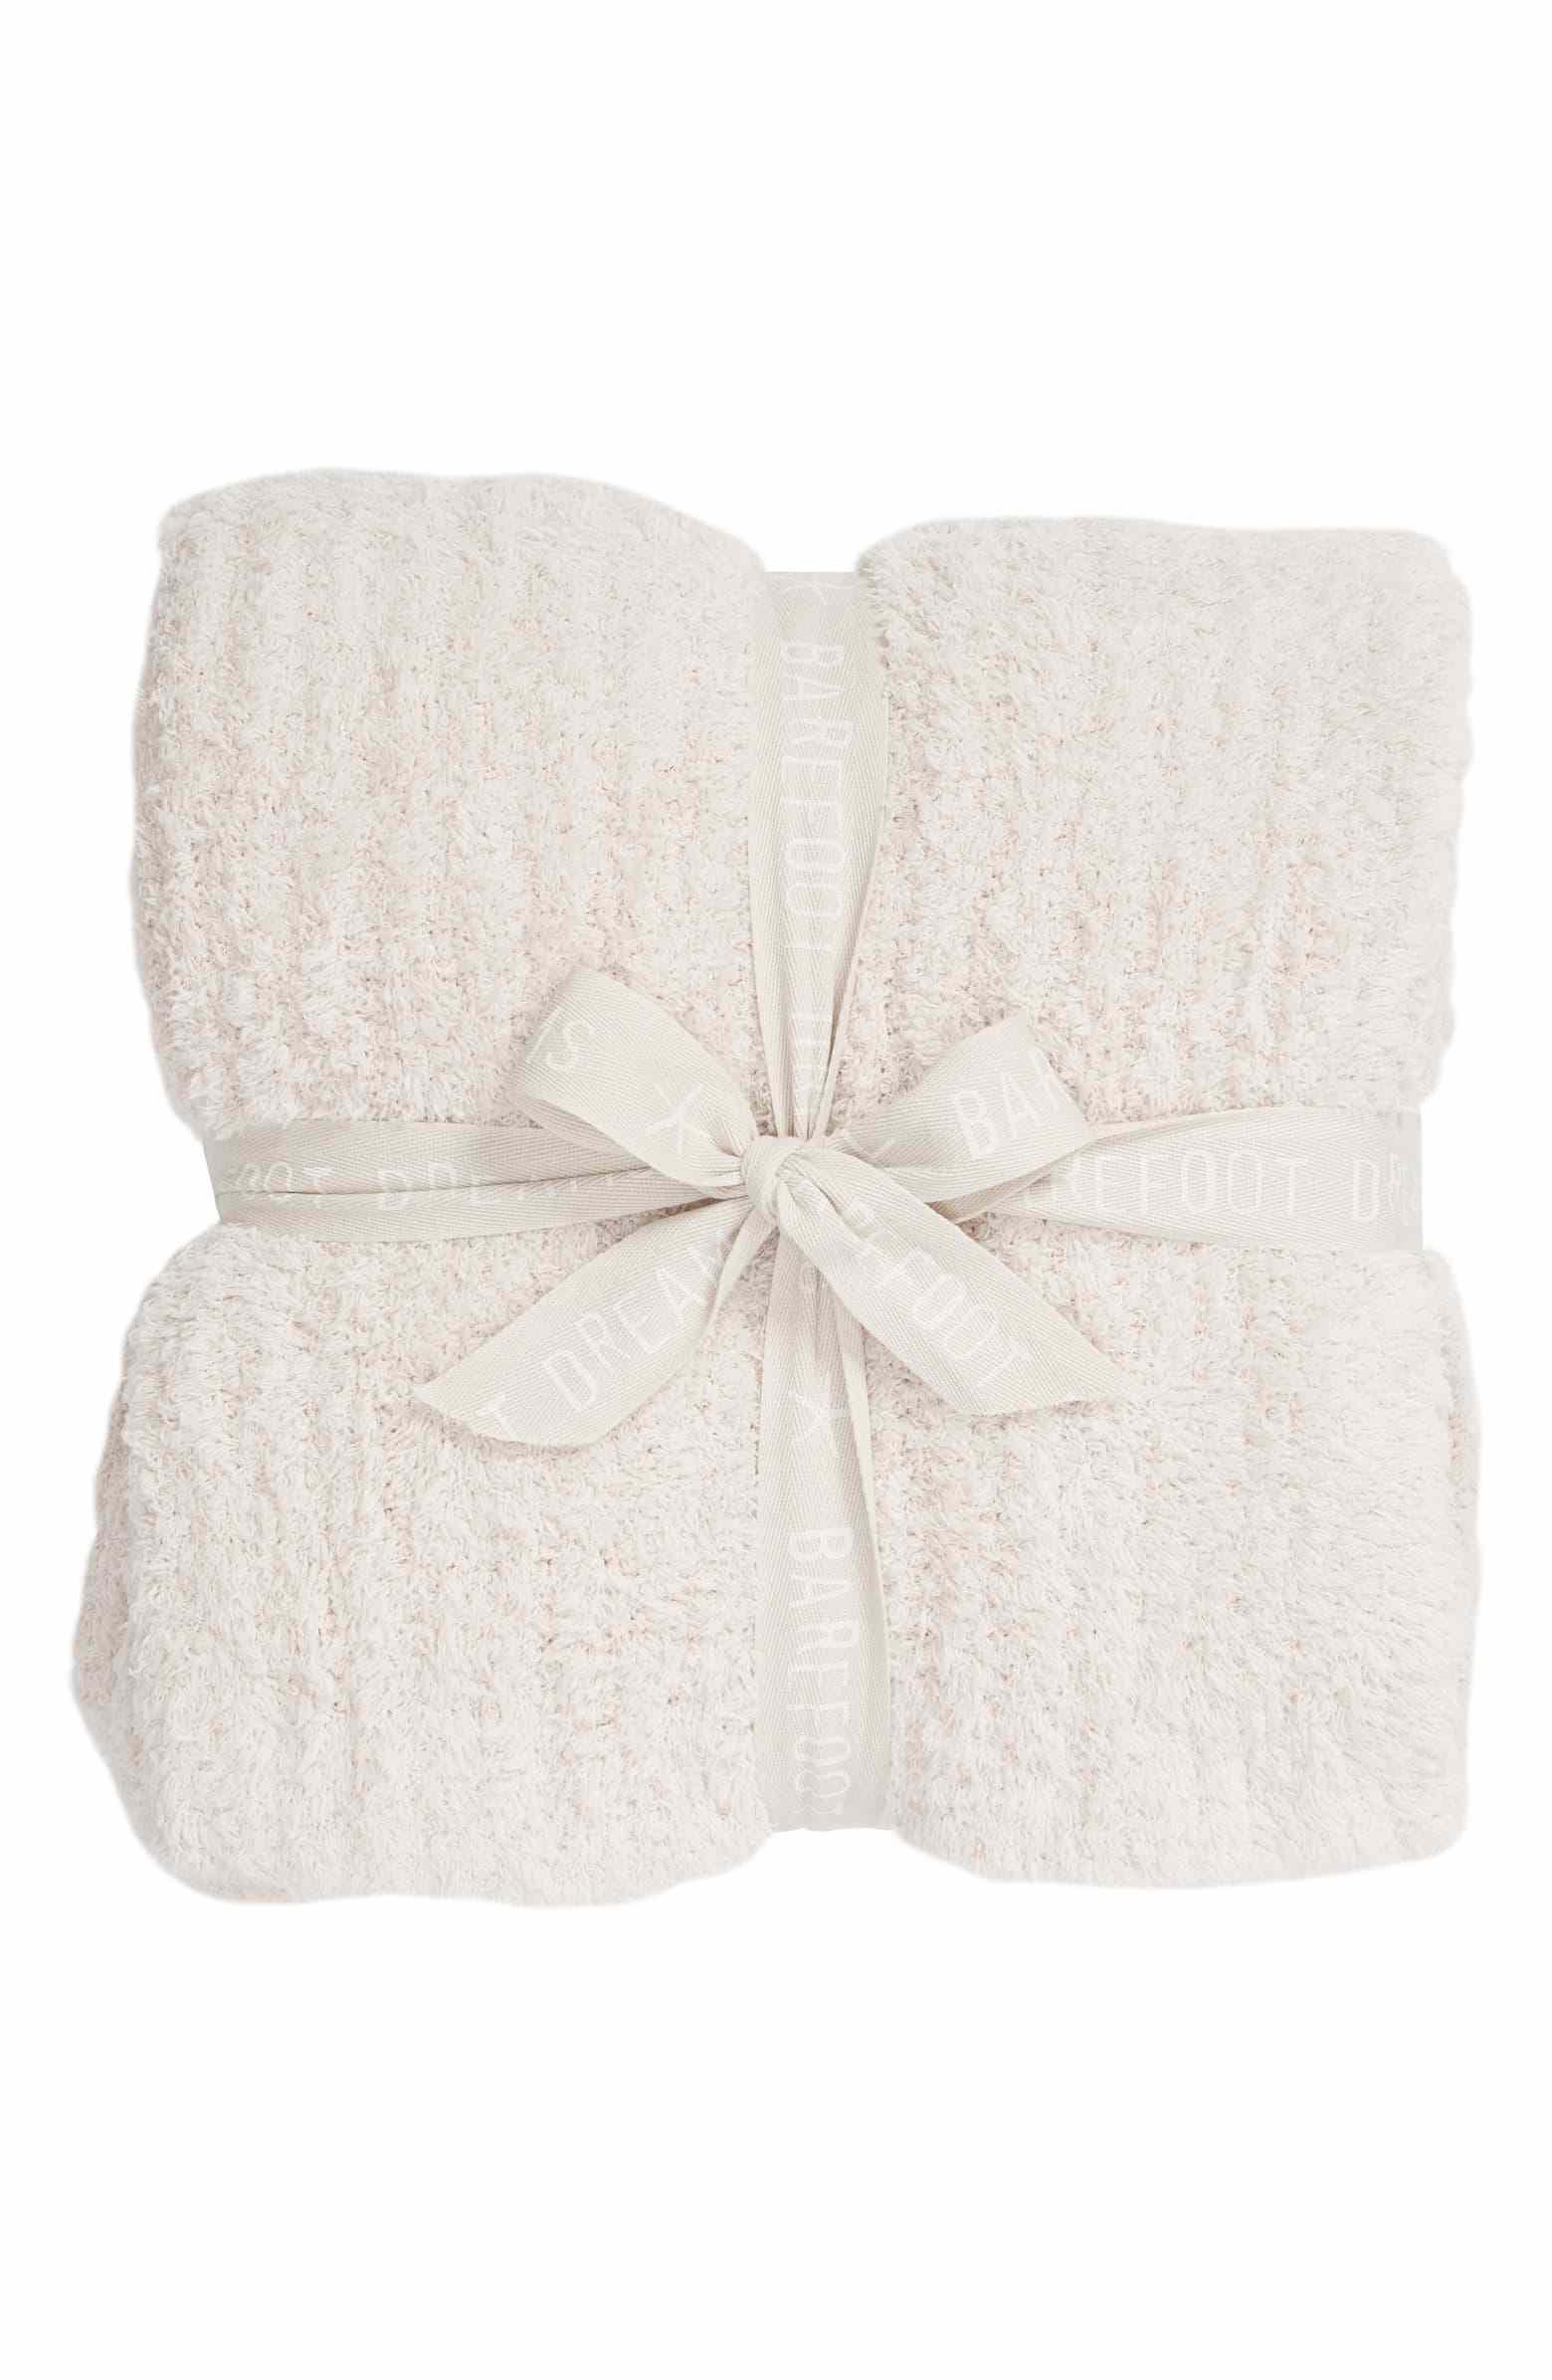 'CozyChic' Ribbed Throw Blanket